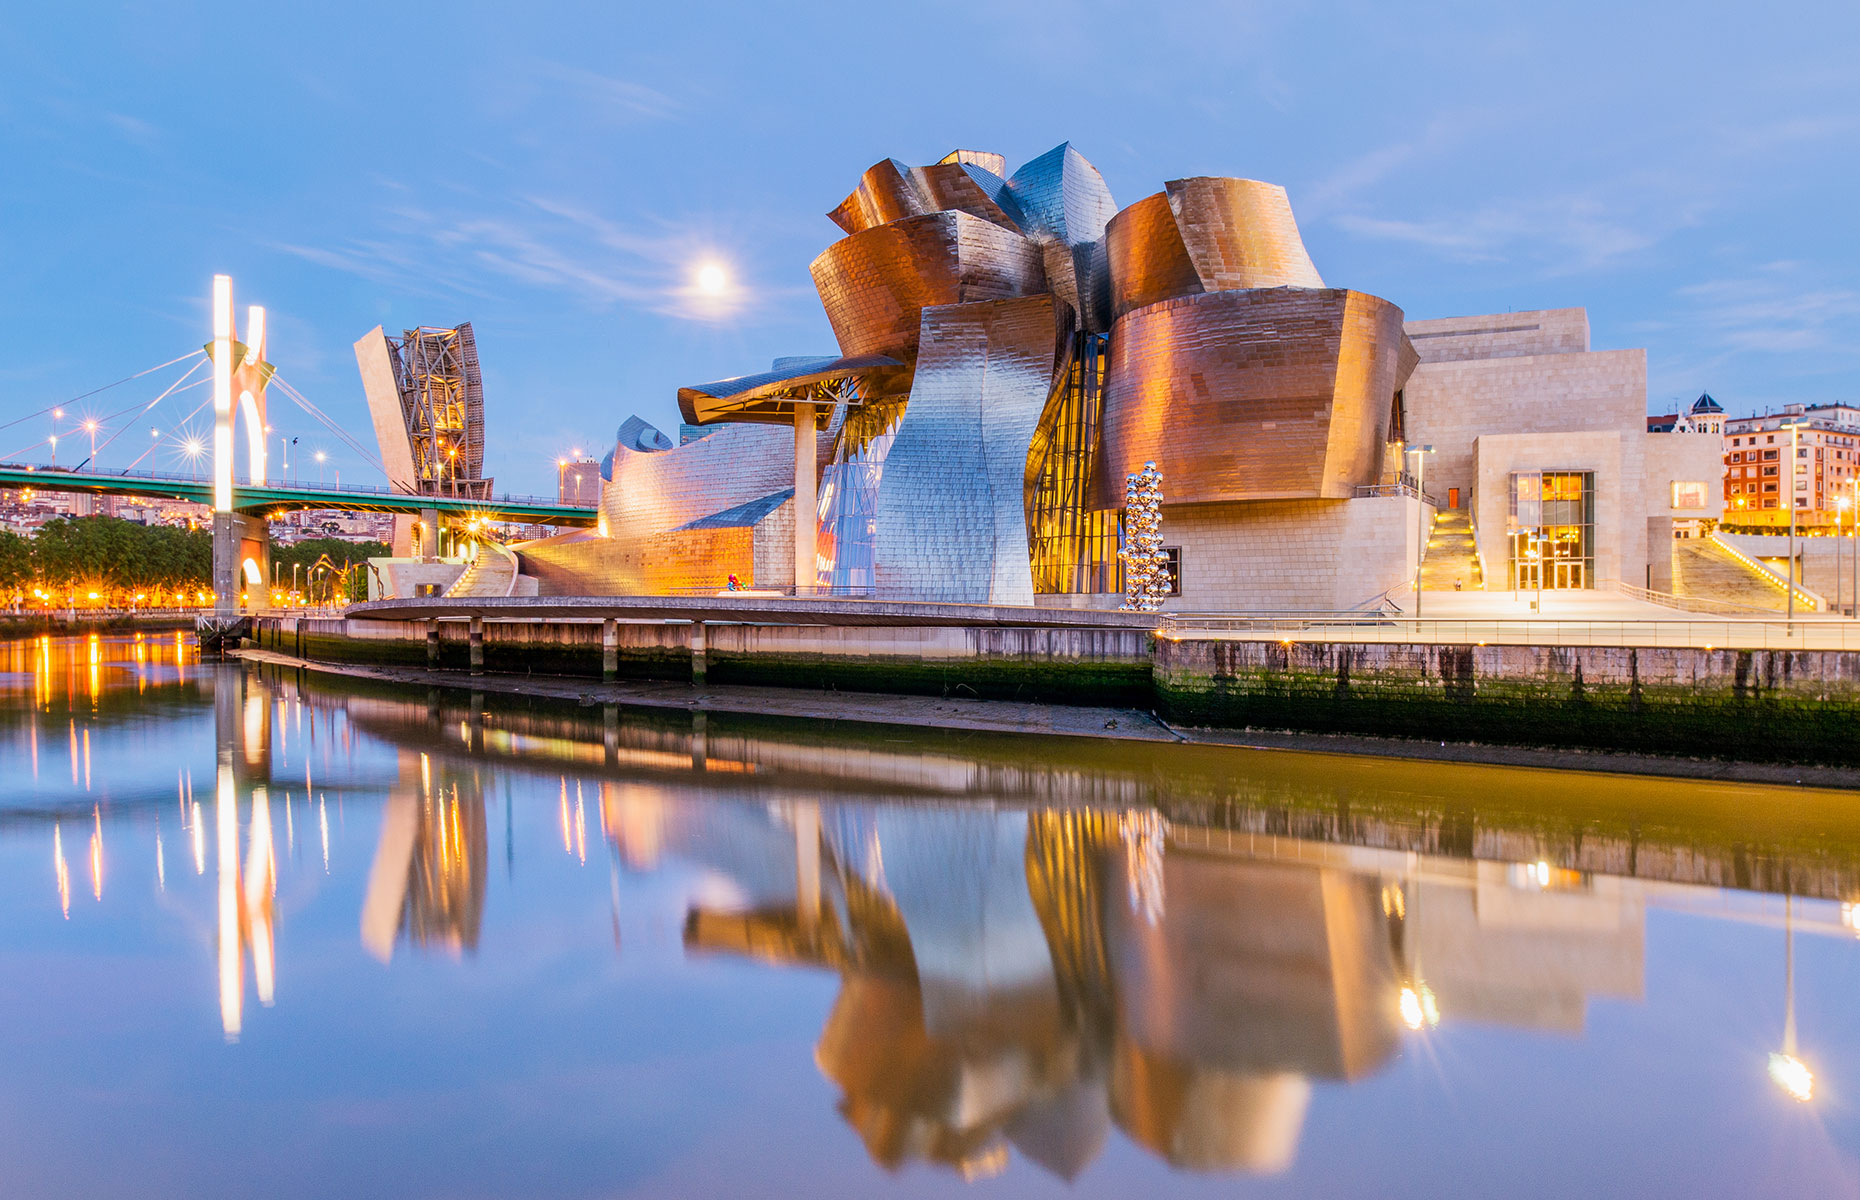 Guggenheim Museum, Bilbao (Image: Rudy Mareel/Shutterstock)